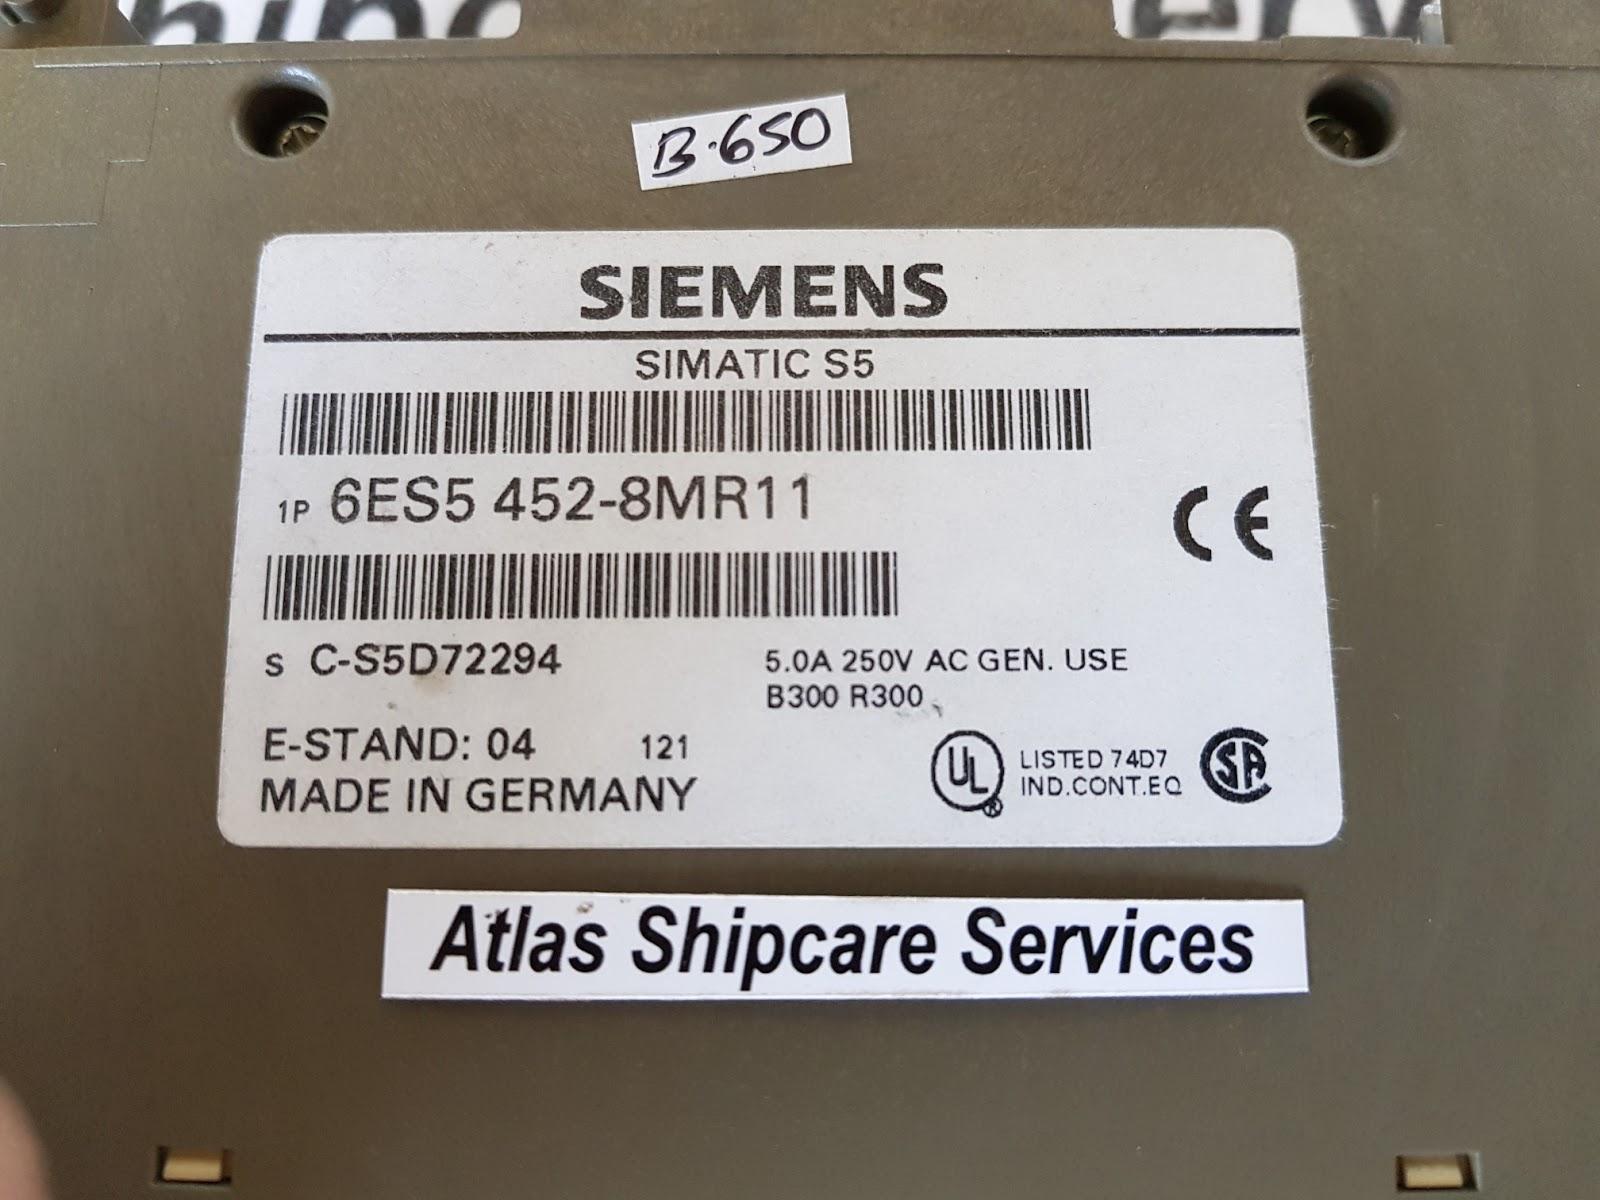 Siemens simatic s5 6es5 452-8mr11 modules 6es5452-8mr11